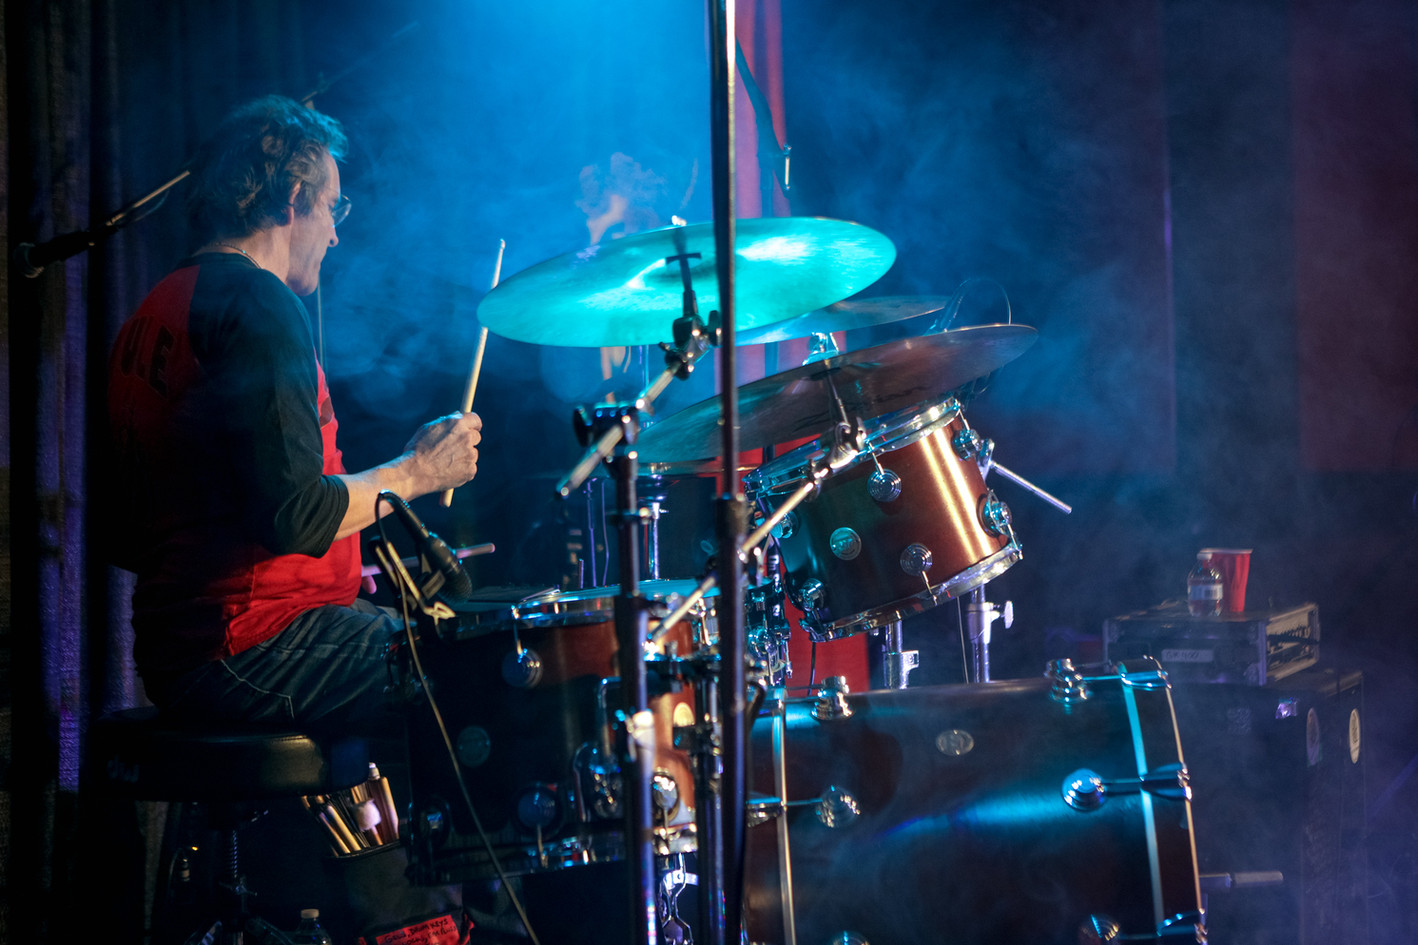 Revelator Hill drummer Gary Crockett